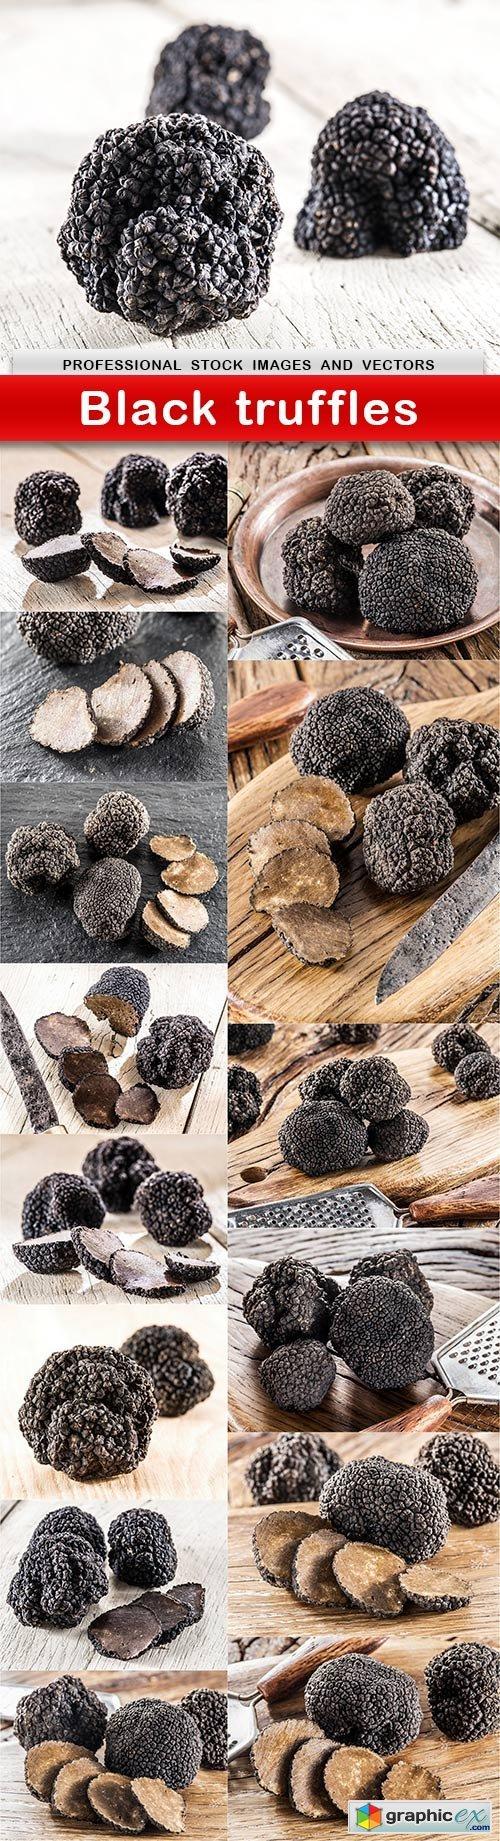 Black truffles - 15 UHQ JPEG